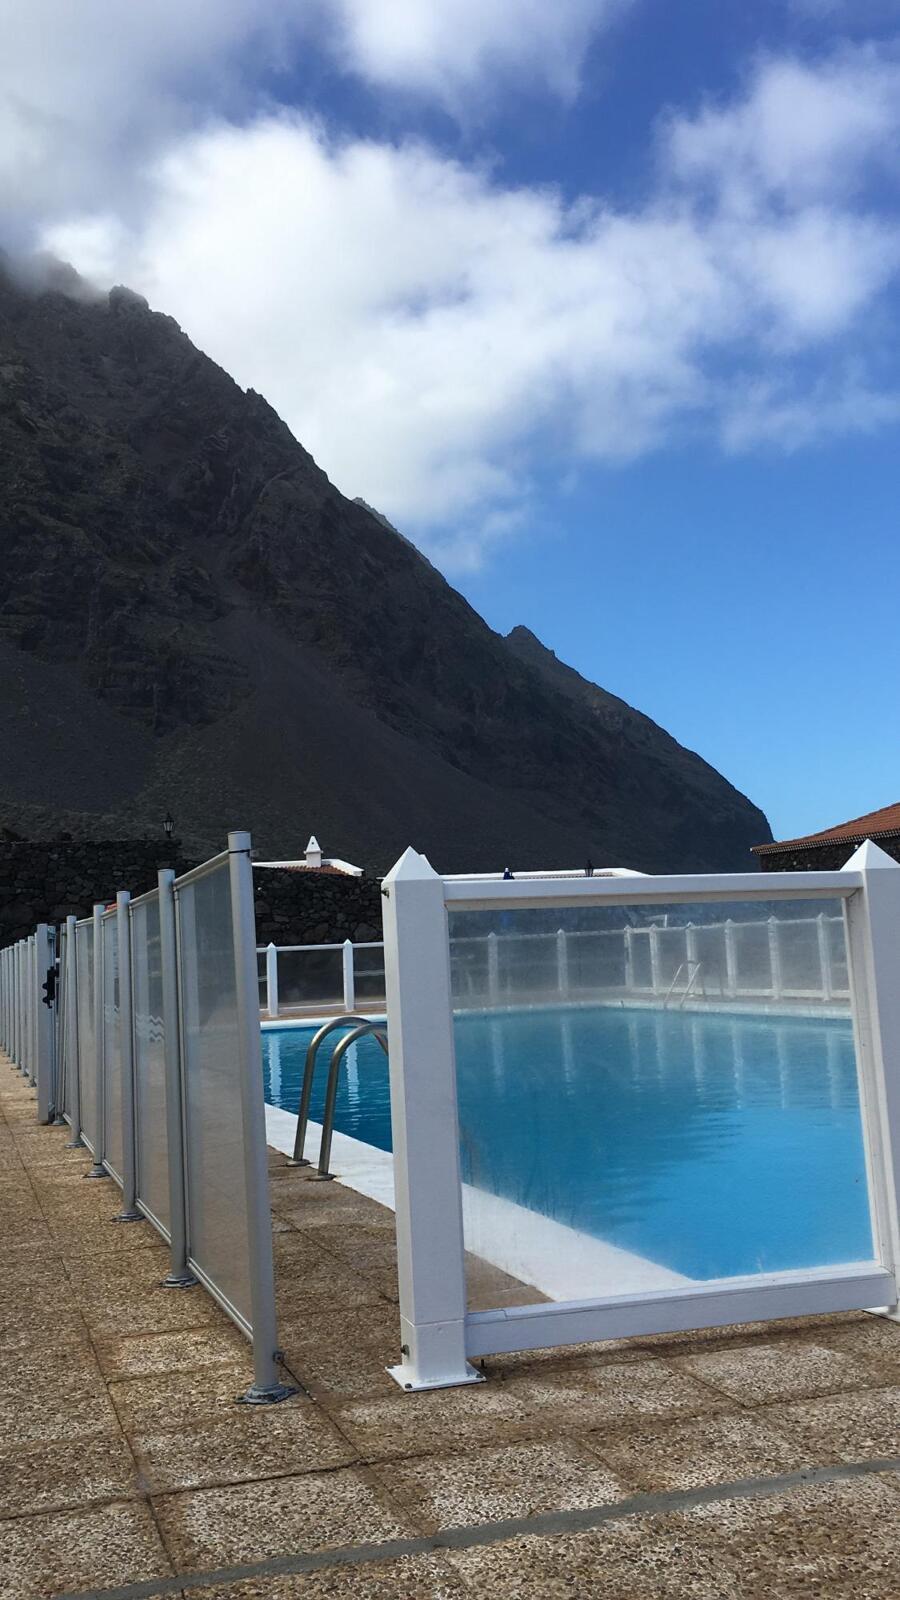 Hotel balneario pozo de la salud sabinosa for Zimmer auf spanisch